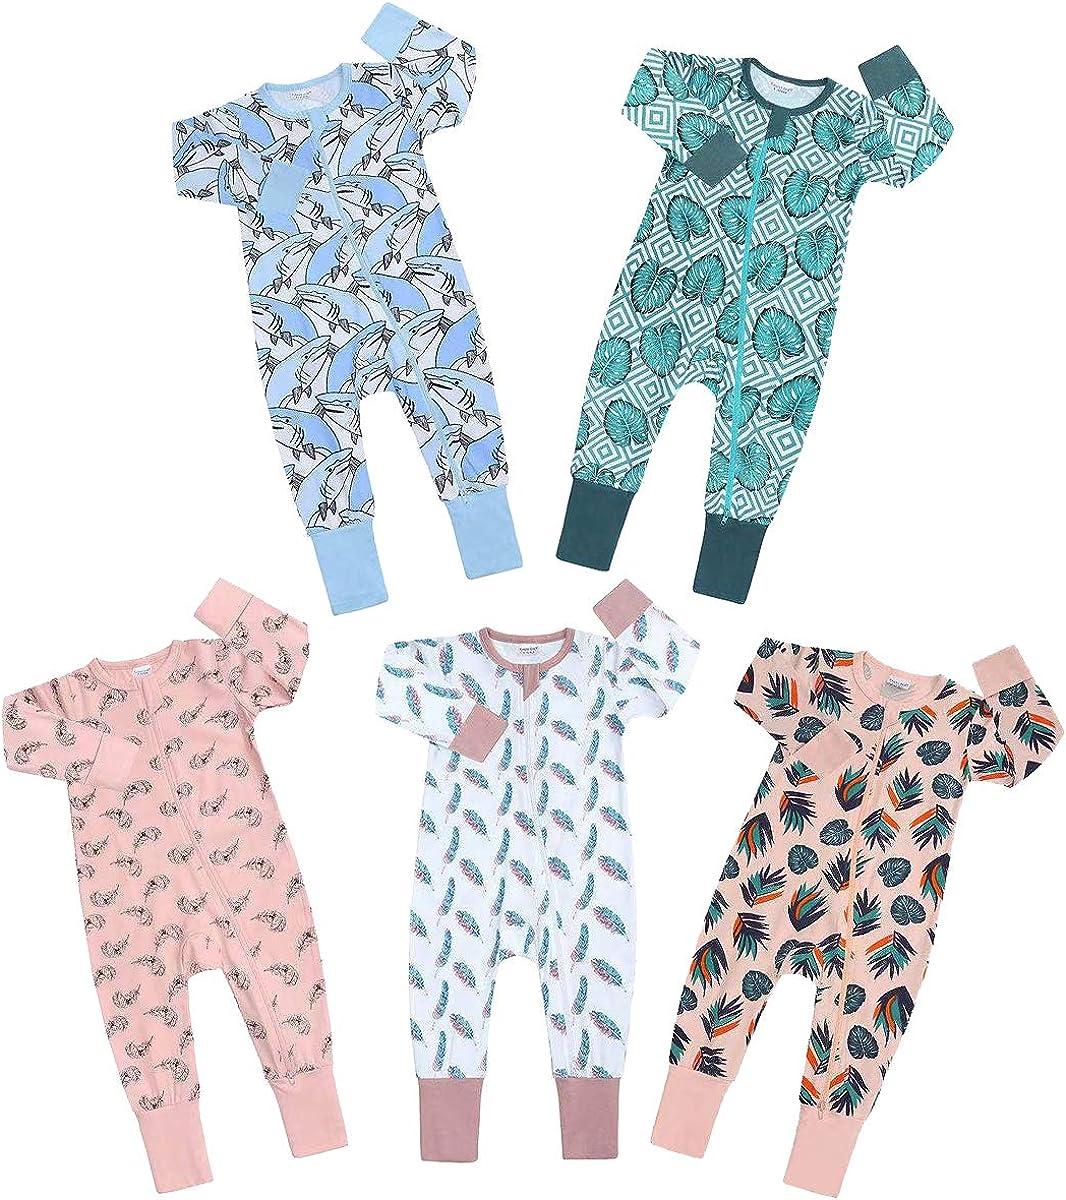 favorite KaWaii Baby Cotton Bodysuit and S Set Wear Discount mail order Sleeper